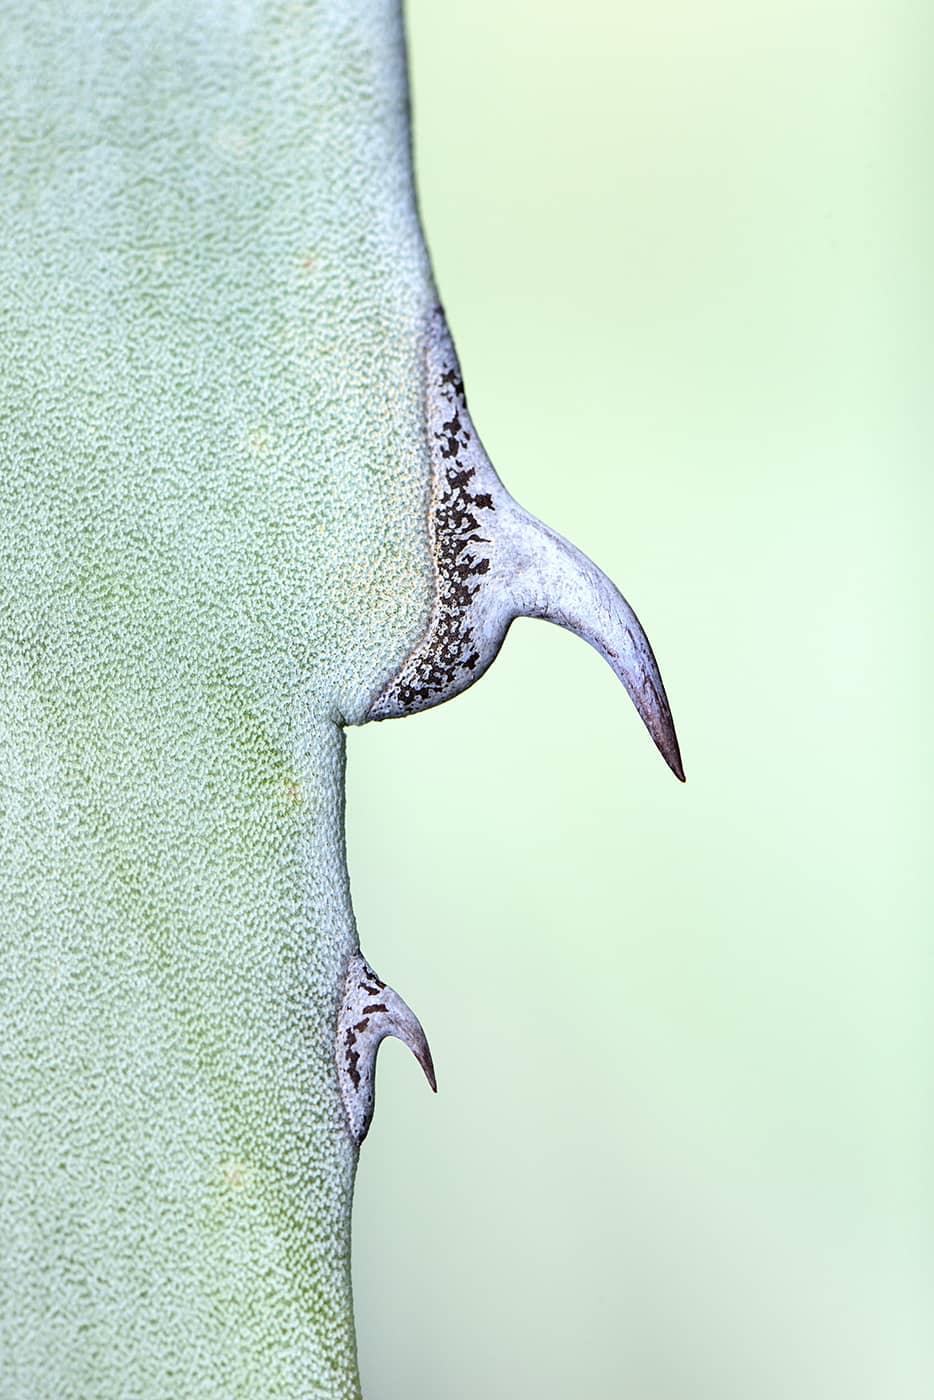 """Agave Plant 1"", photo de Javier Herranz Casellas"